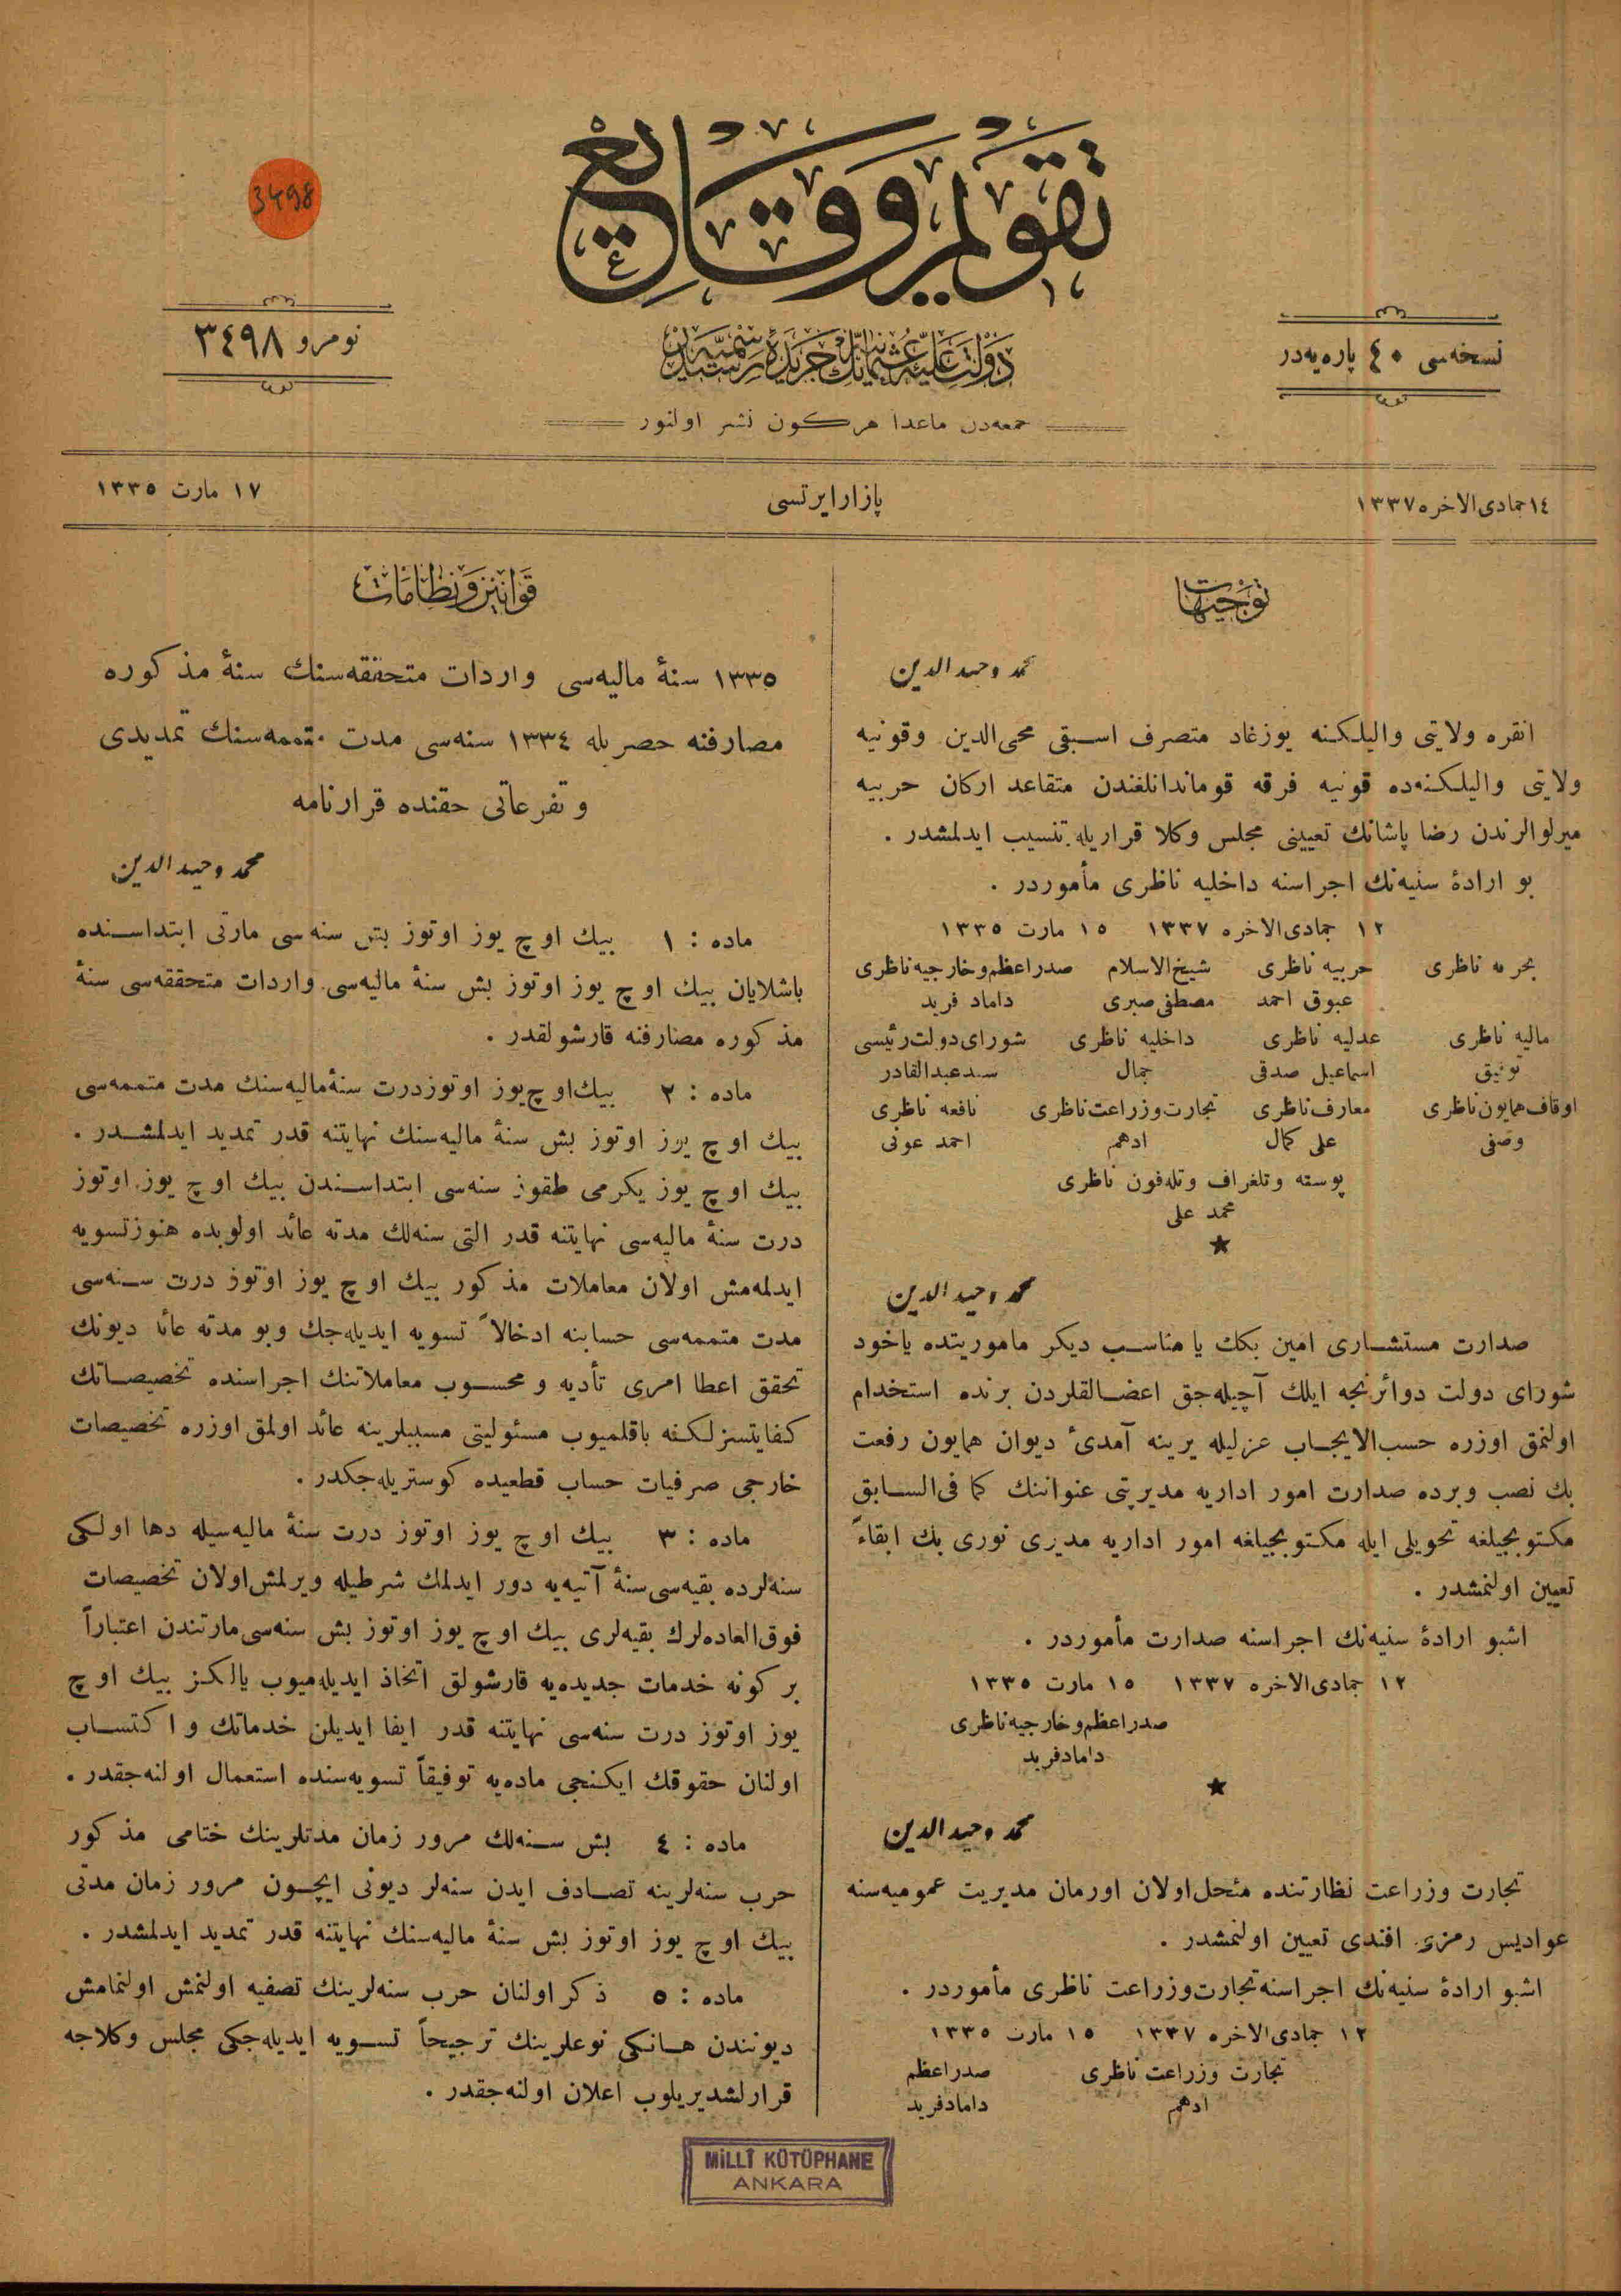 17 Mart 1919 Tarihli Takvim-i Vekayi Gazetesi Sayfa 1